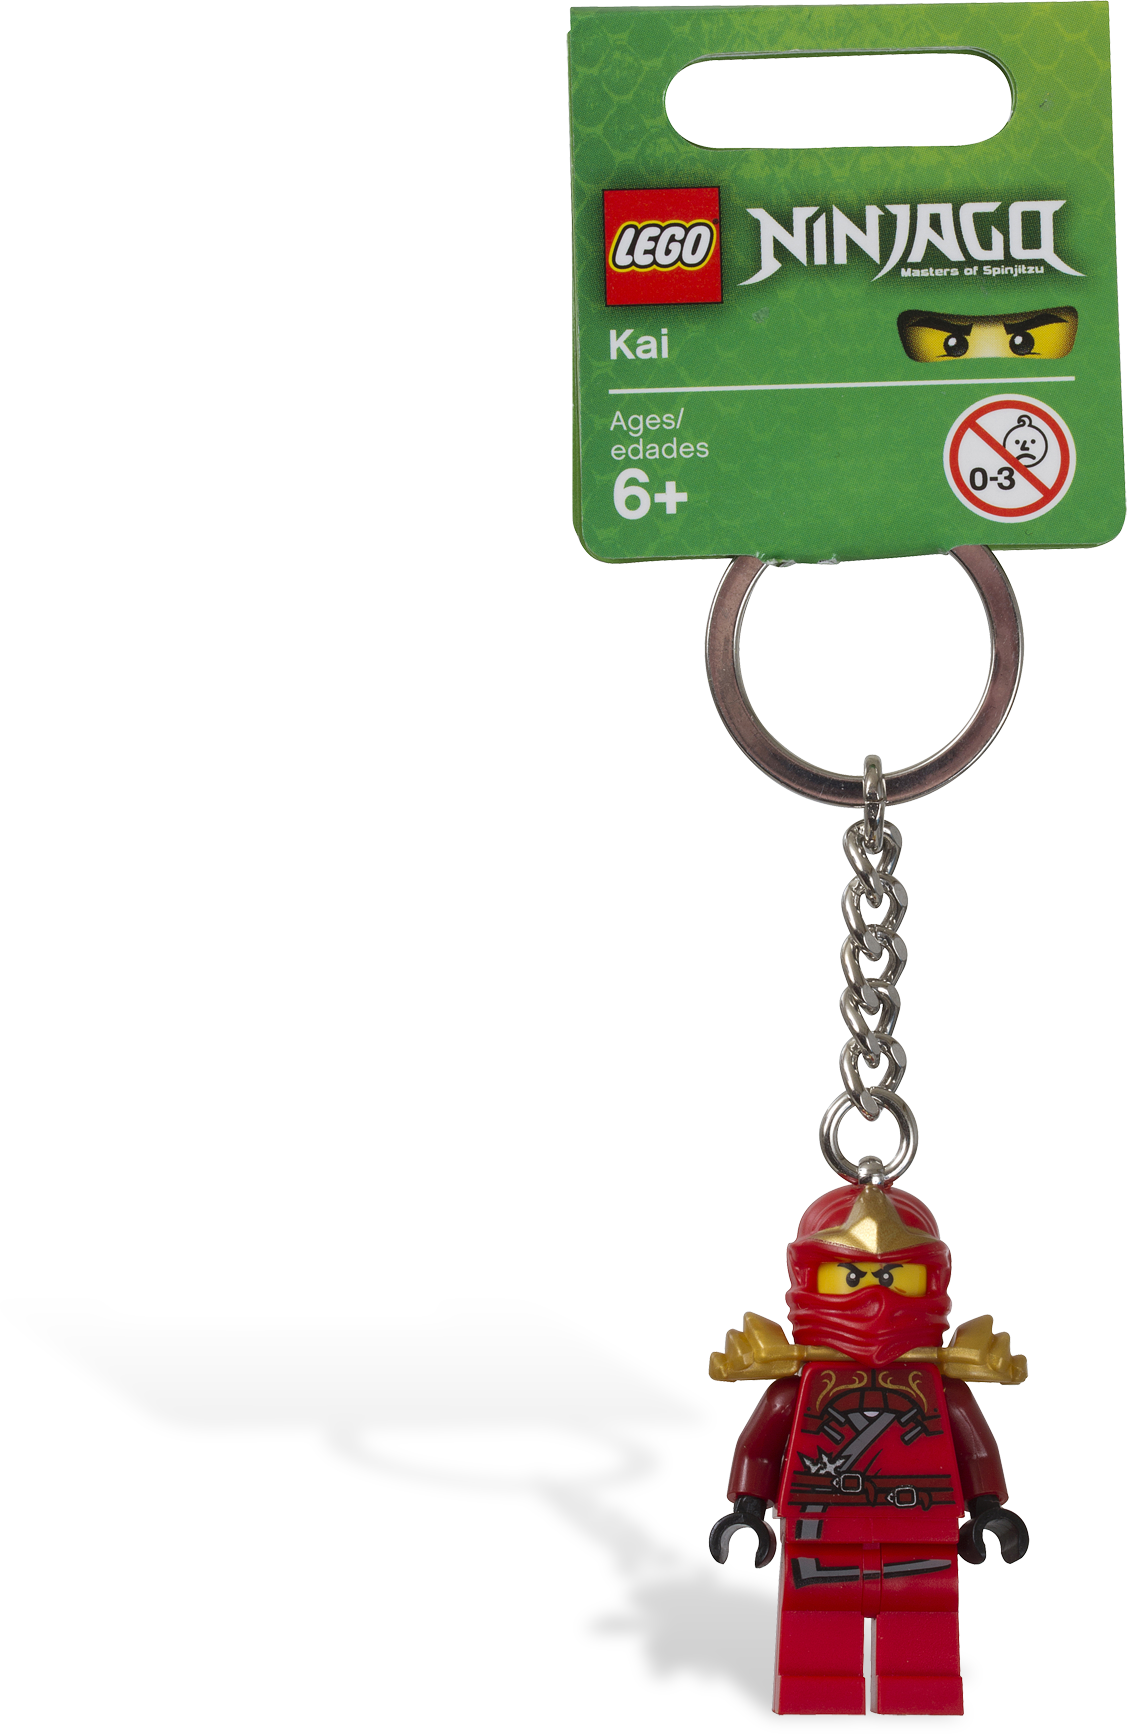 Ninja Kai Chain